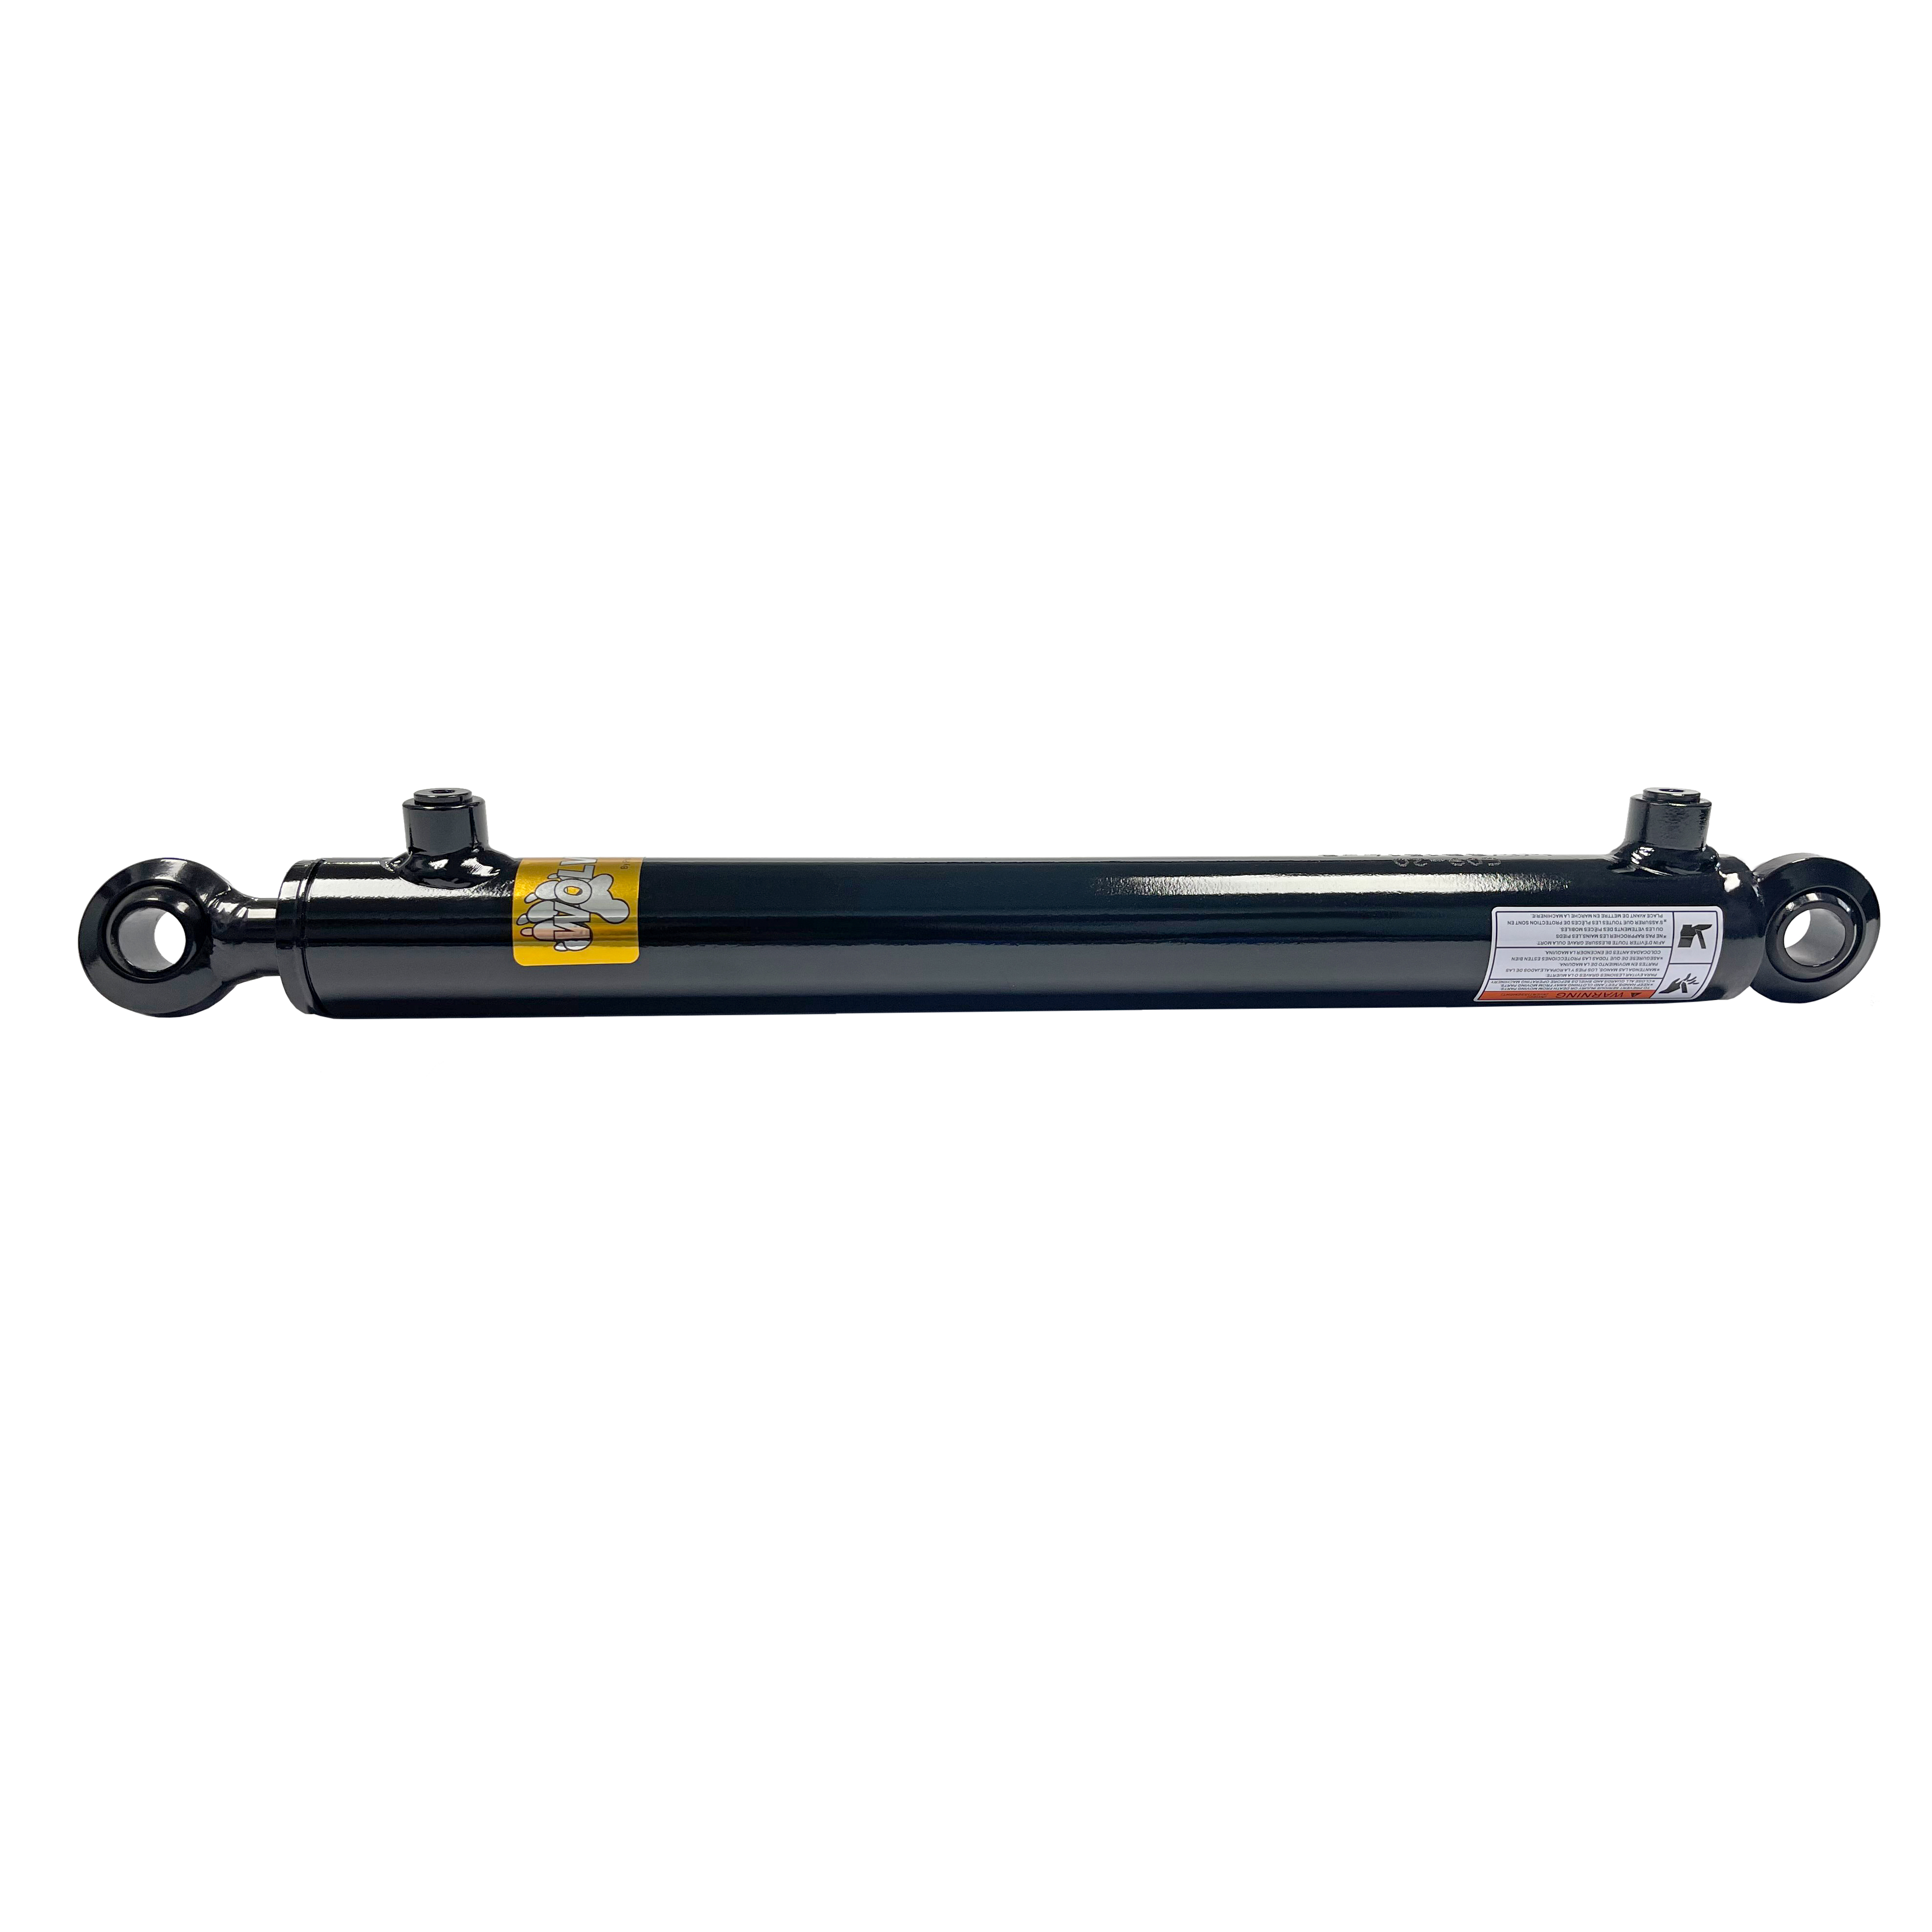 1.5 bore x 6 stroke swivel eye hydraulic cylinder, welded swivel eye double acting cylinder | Prince Hydraulics